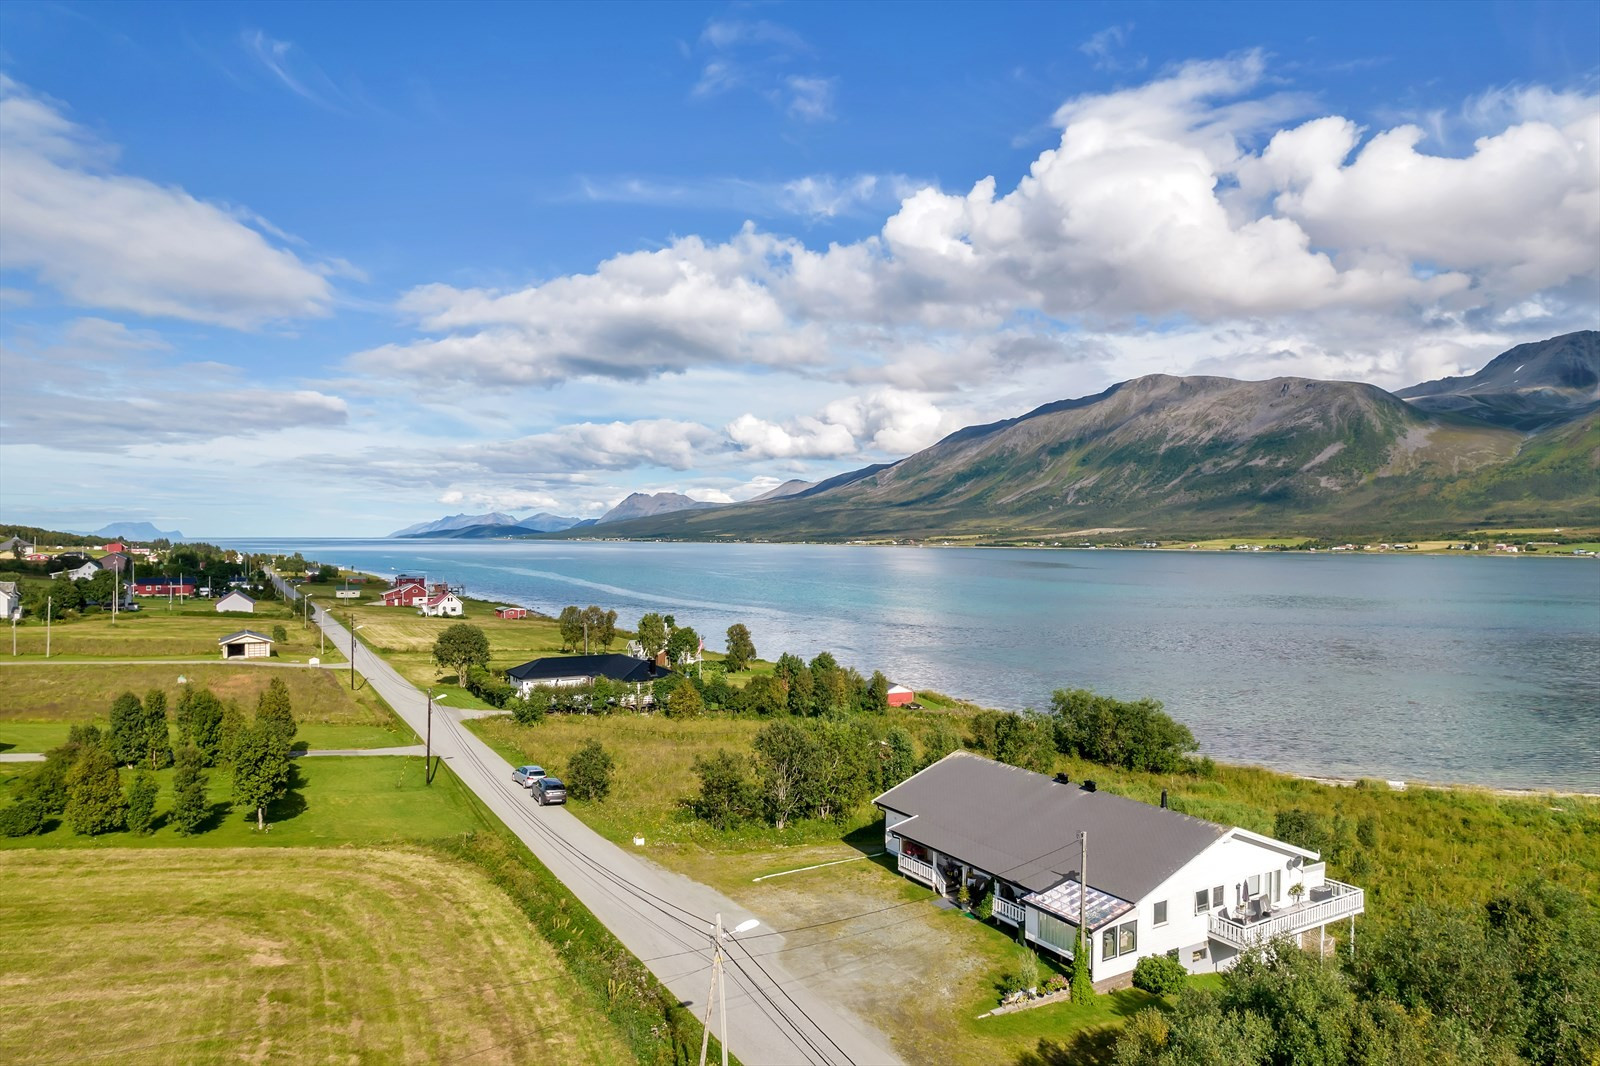 Ytterst i bildet kan man skimte Karlsøy og Arnøya